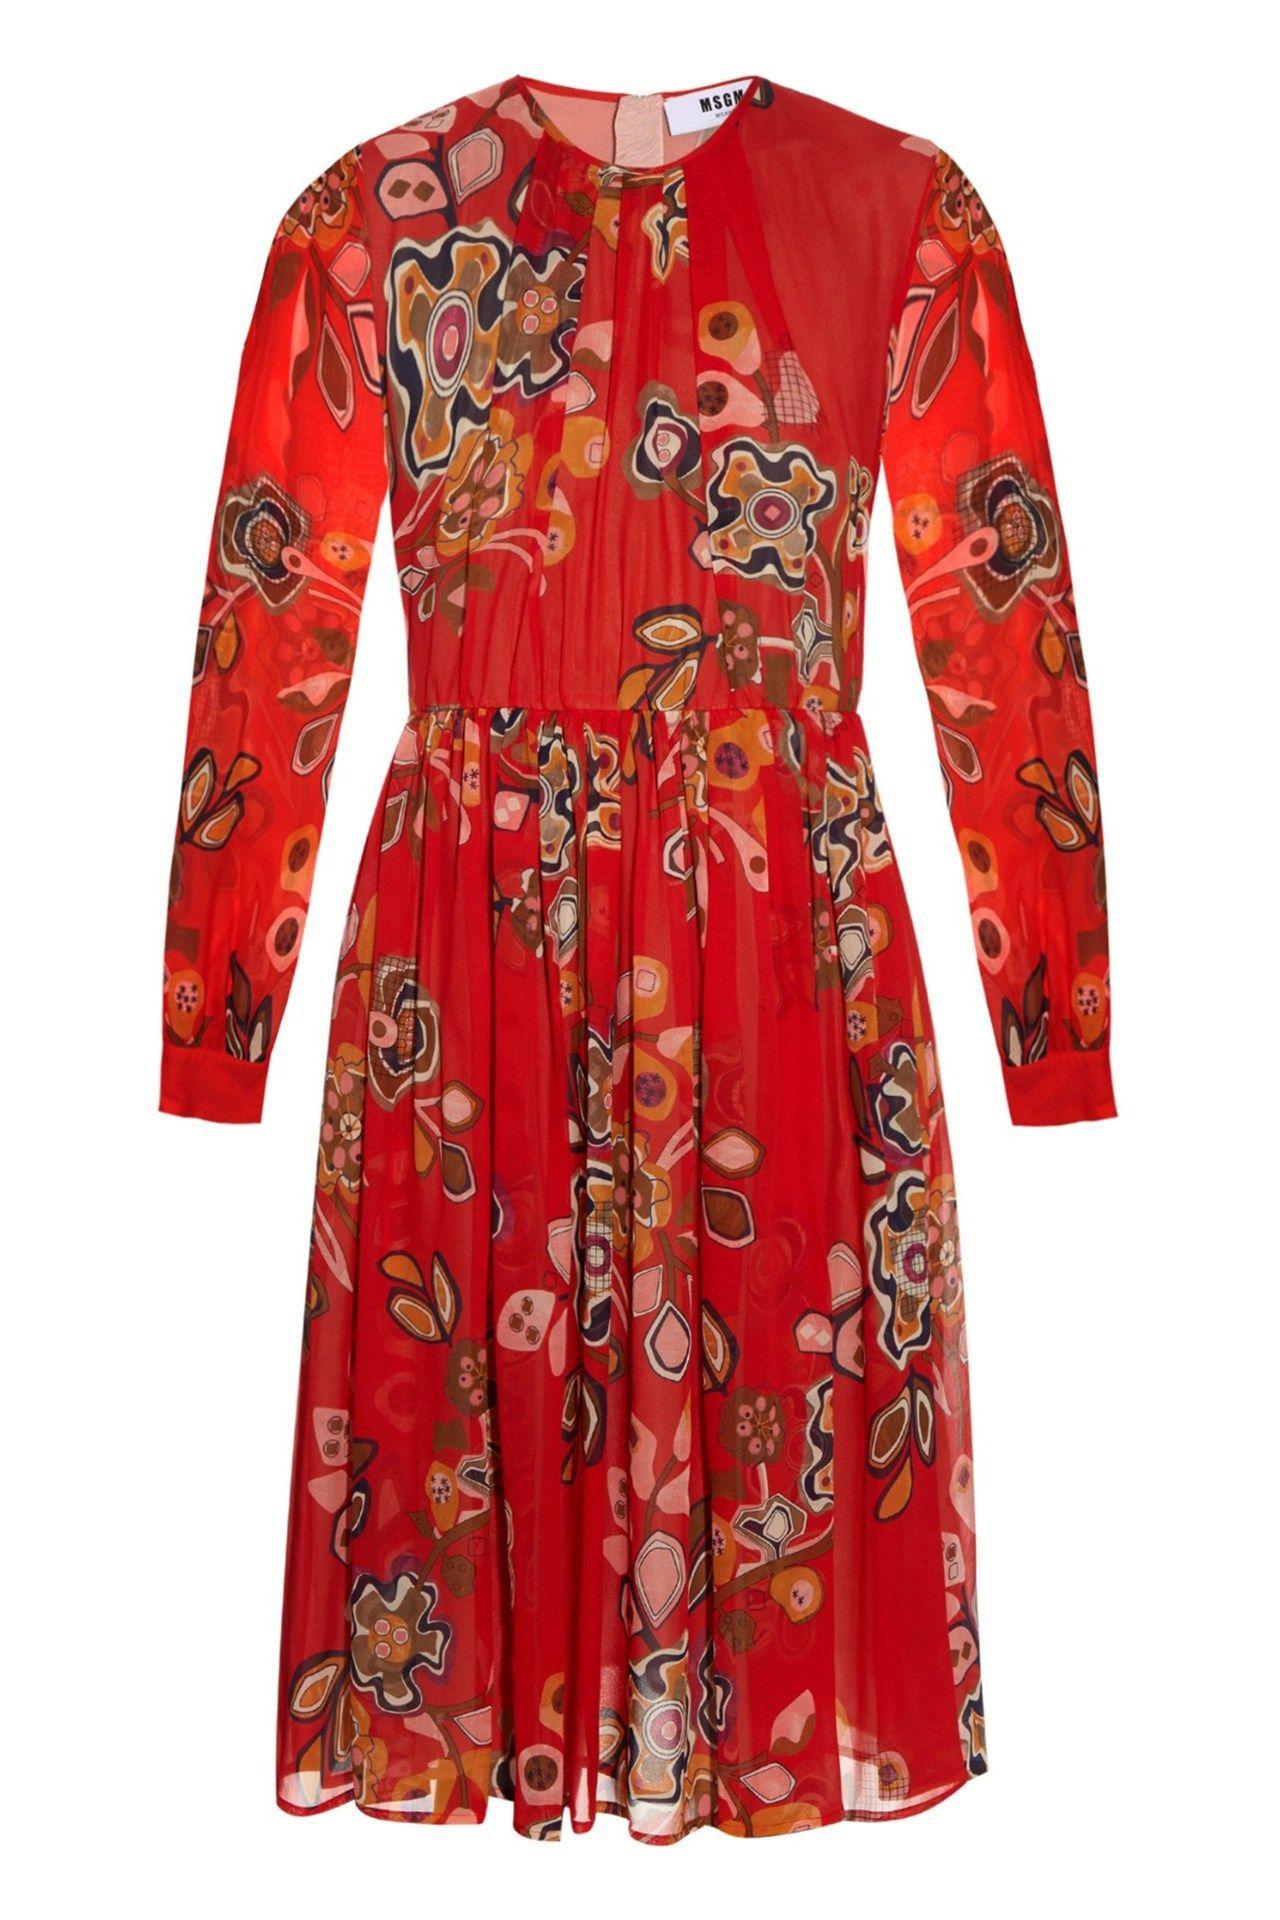 Buy Now: 10 Floral Dresses